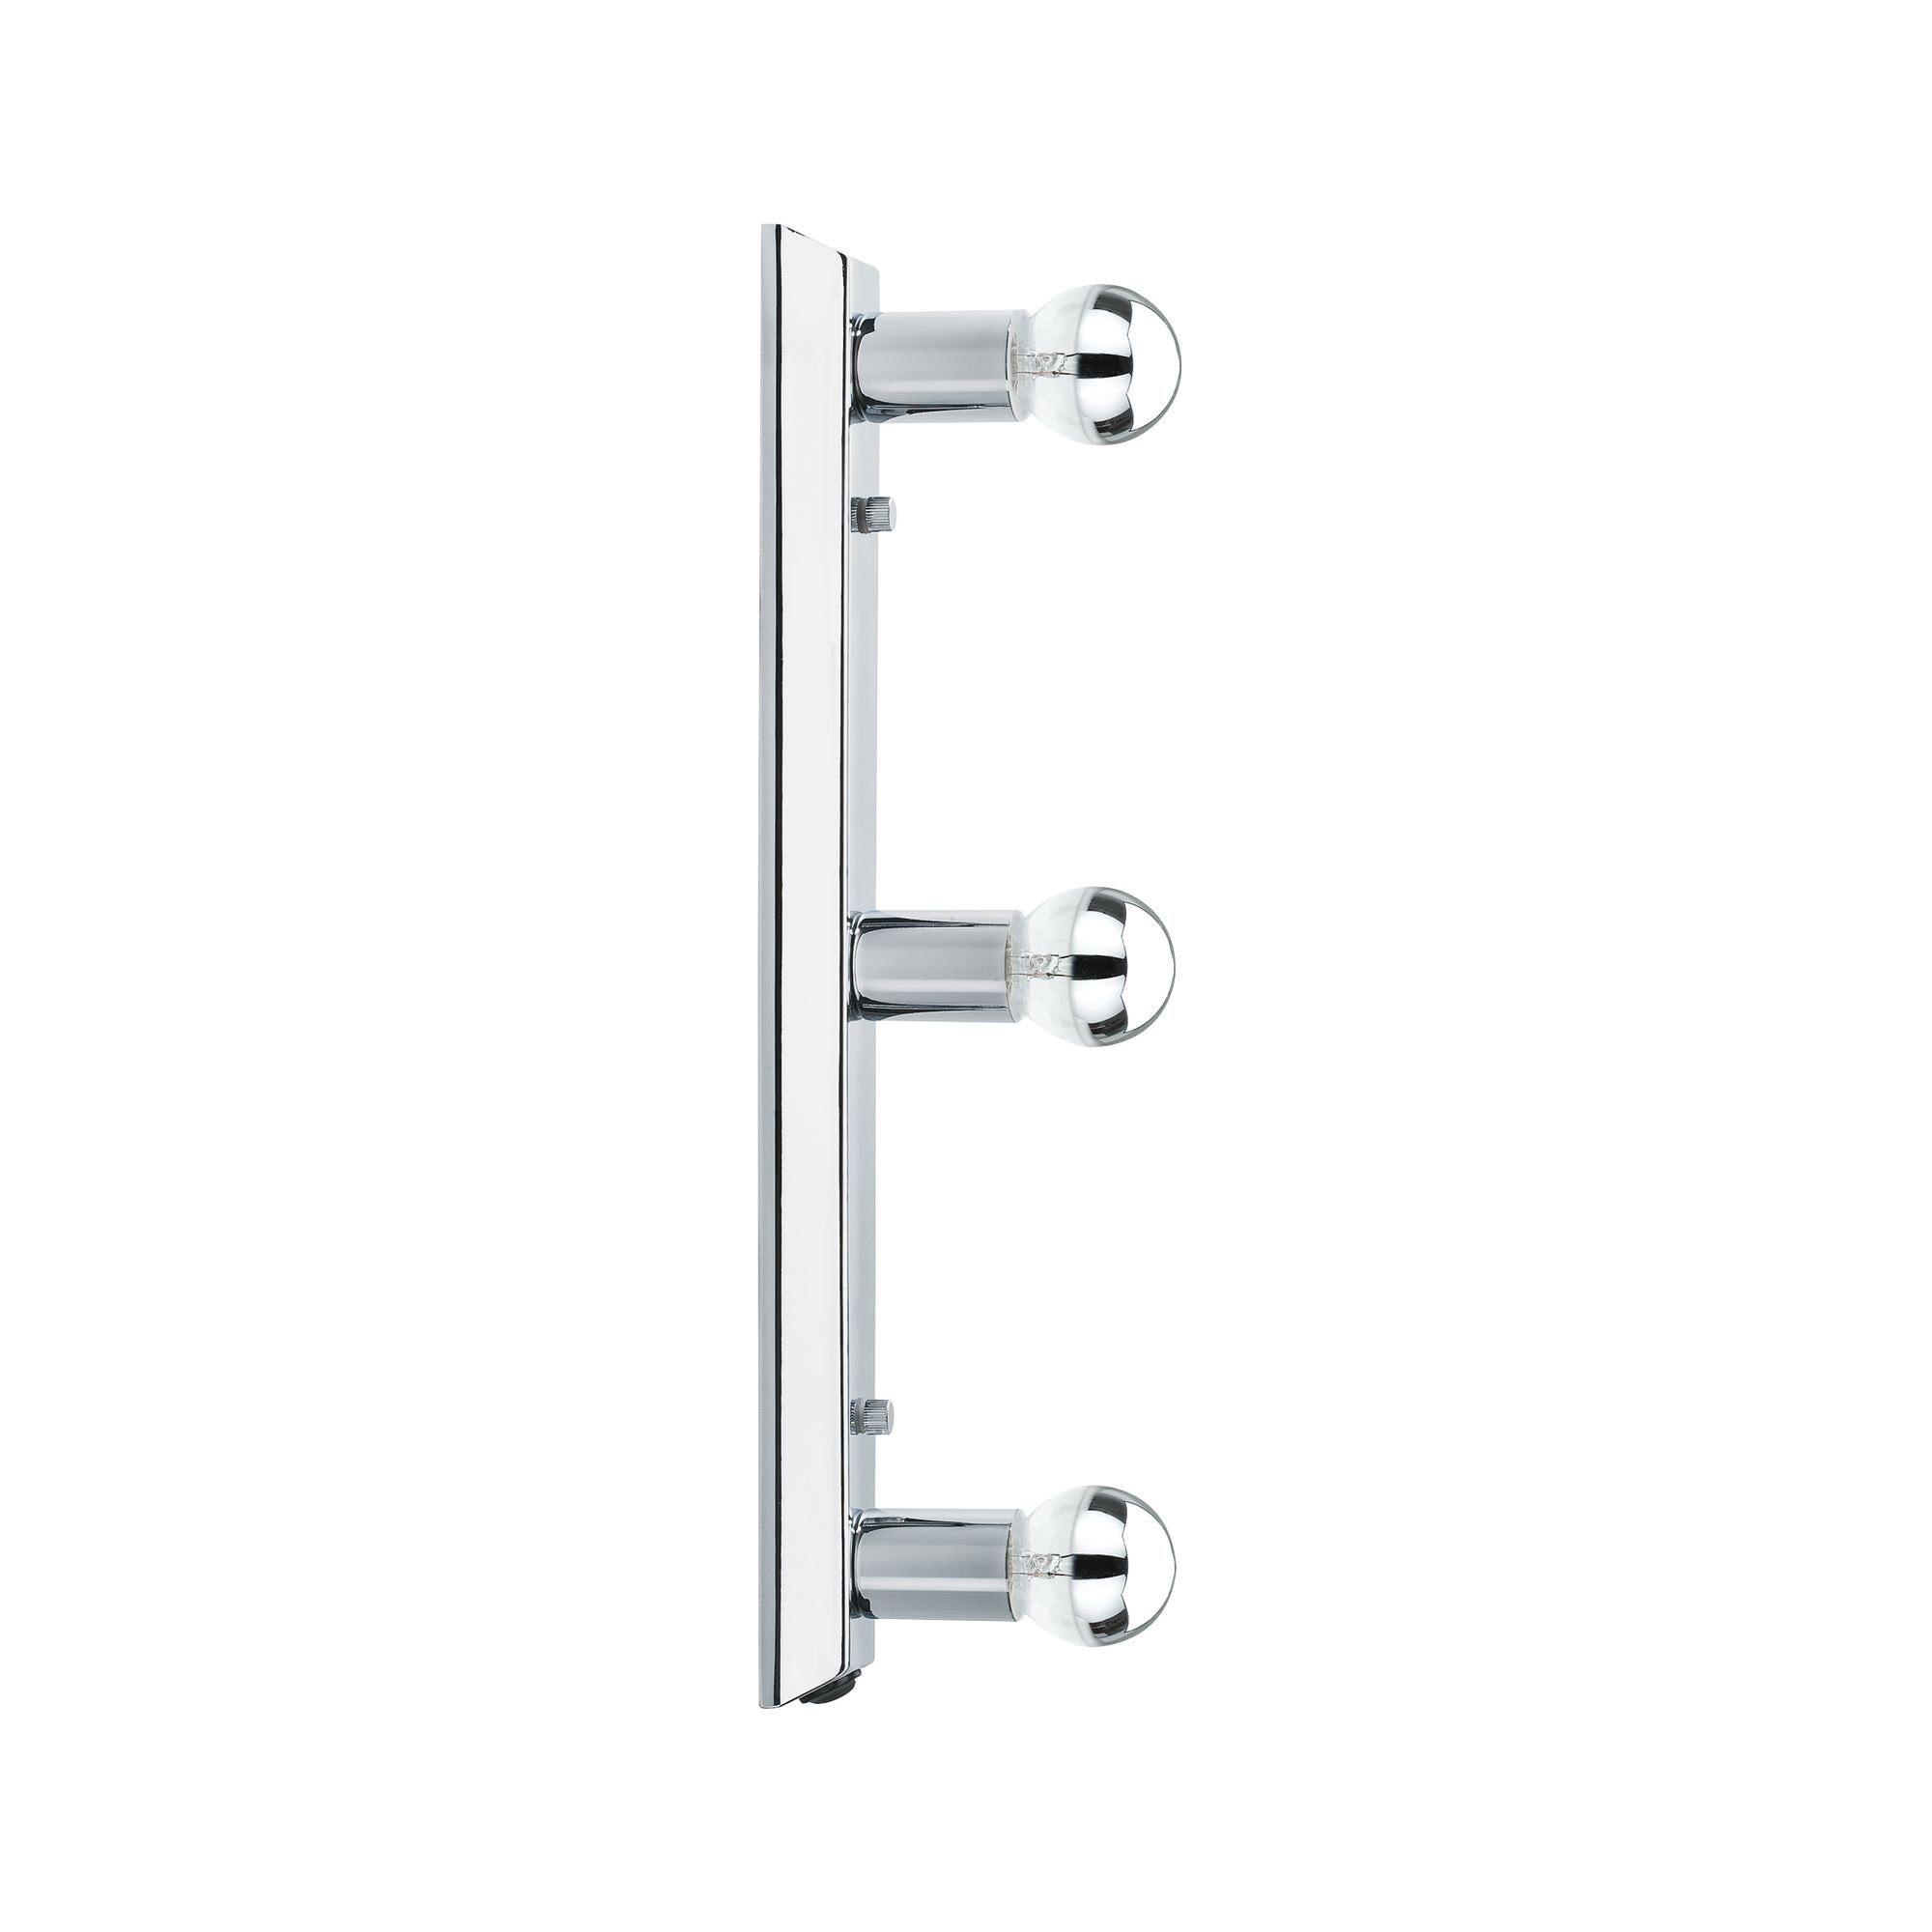 Paulmann LED Wandleuchte Spiegelleuchte Regula Chrom max. 40W E14, E14, 1 St.